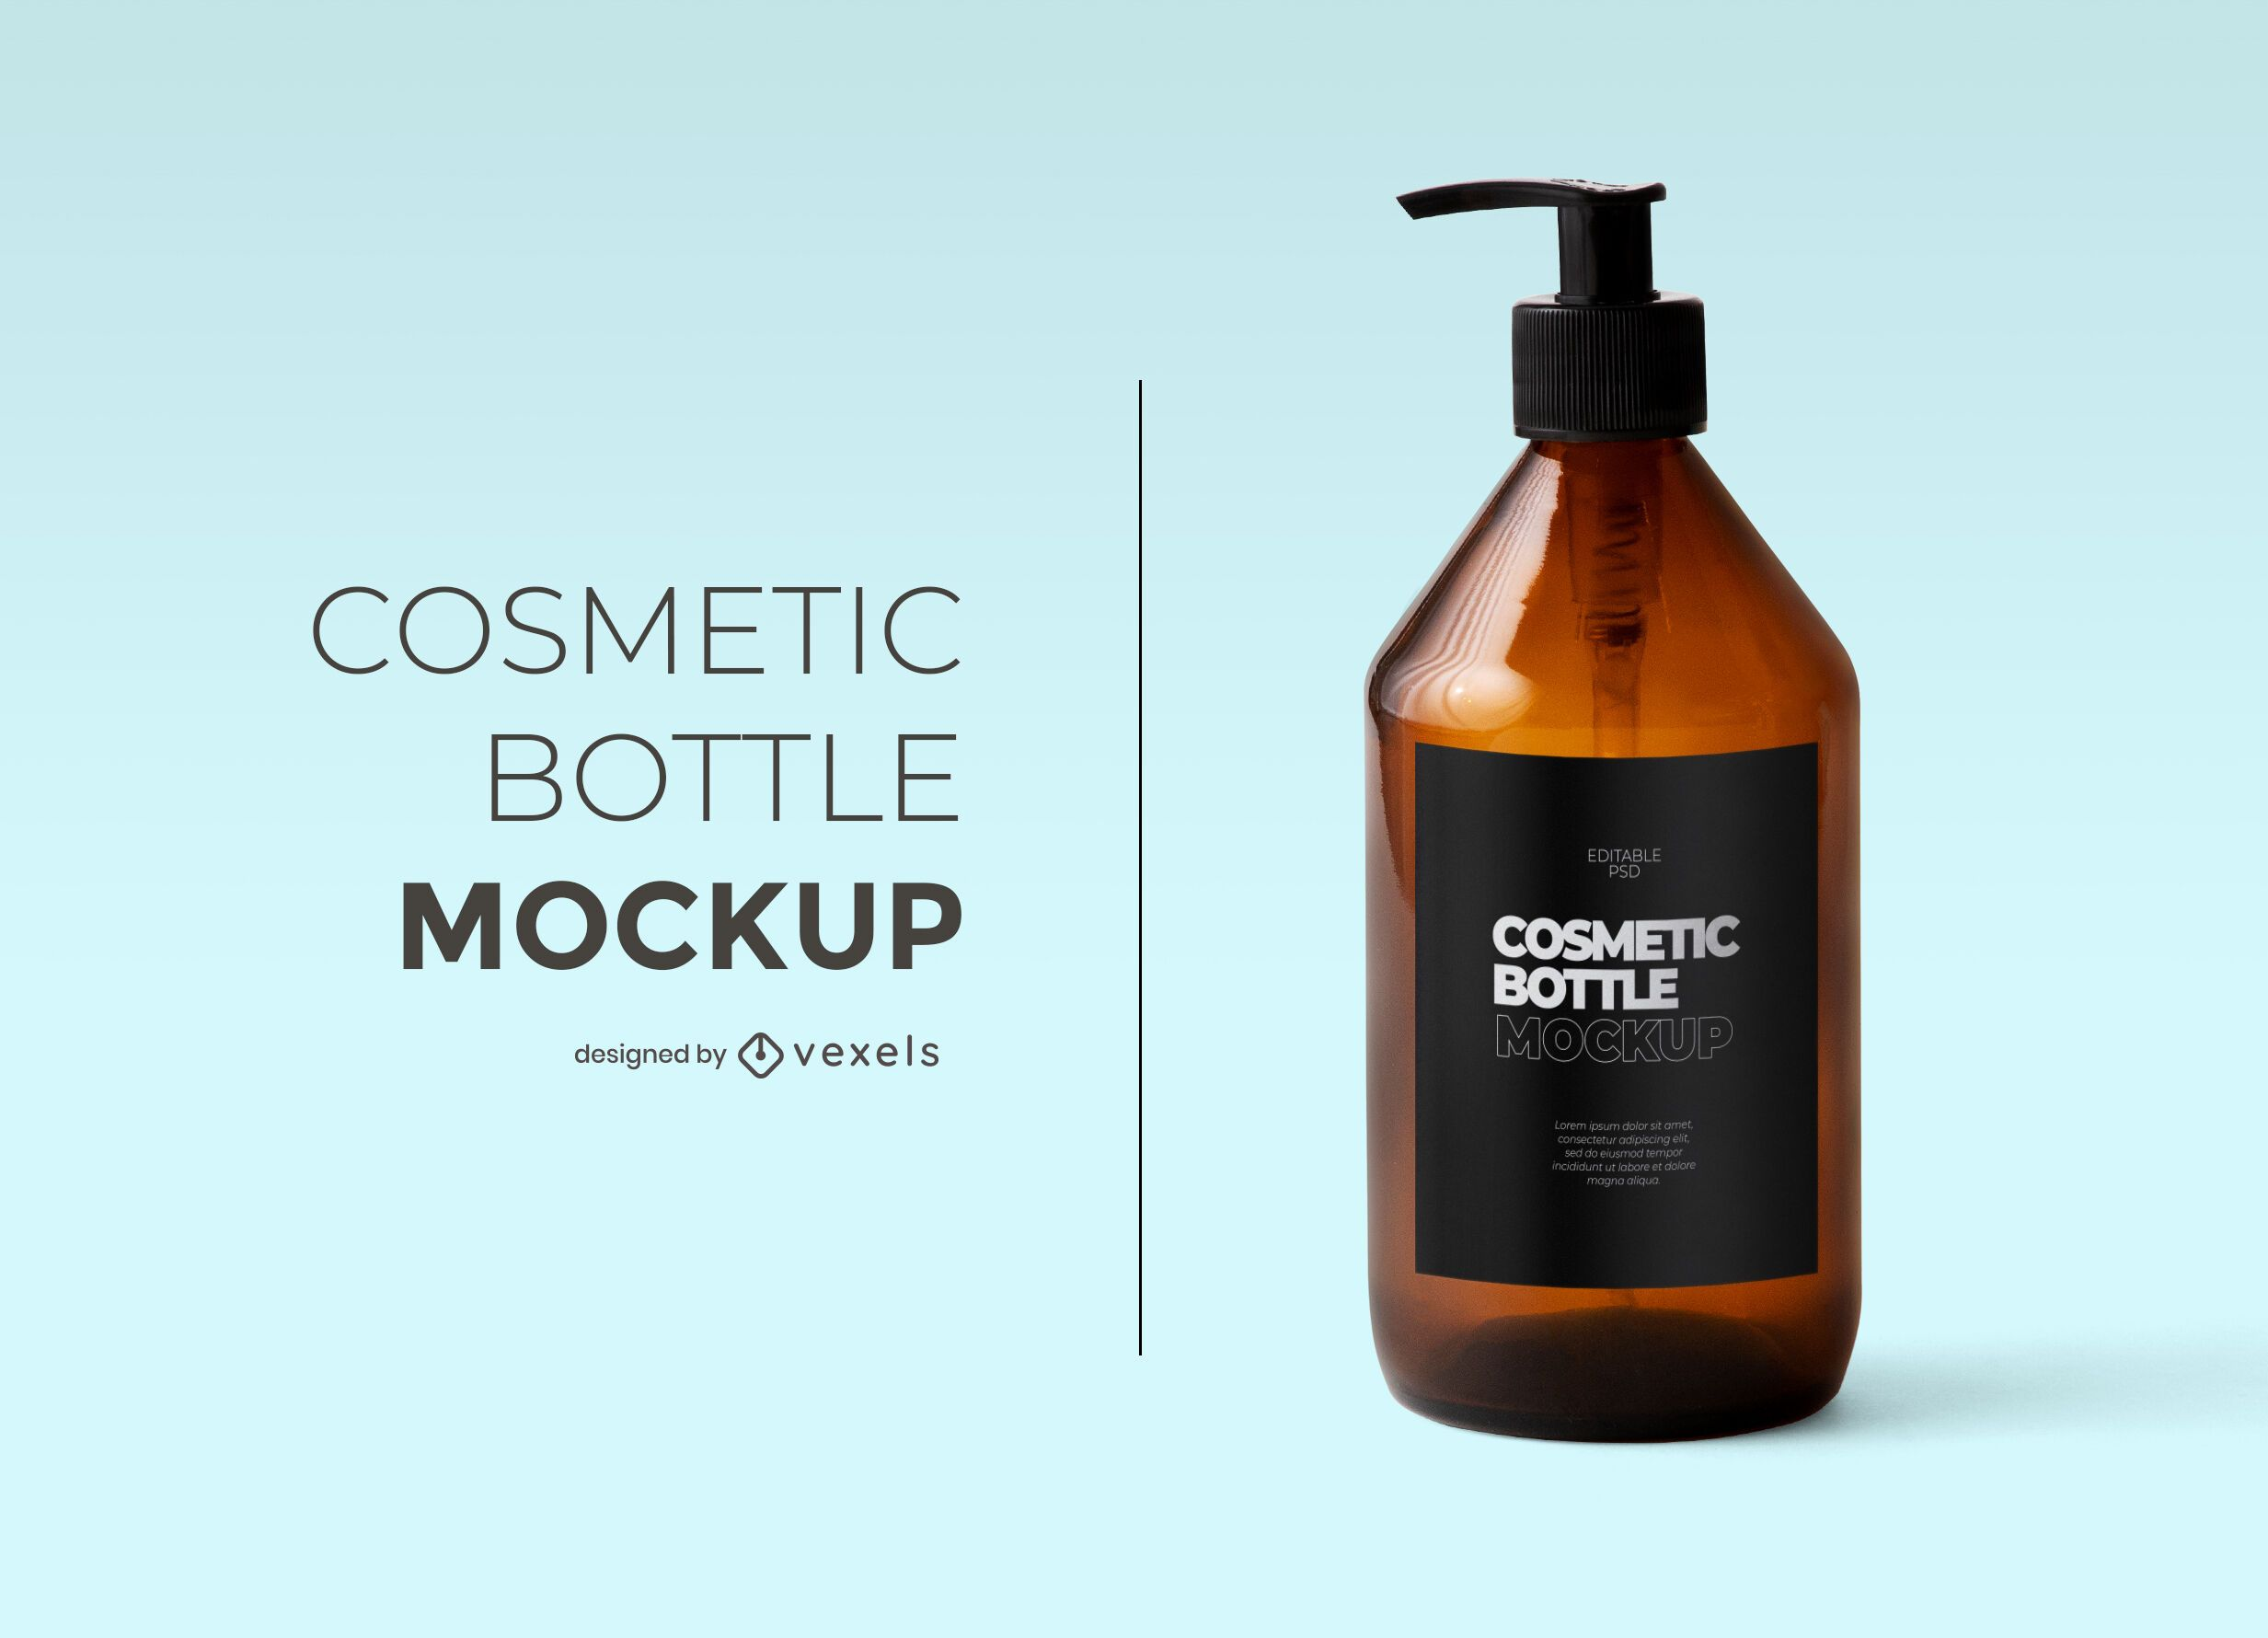 Cosmetic bottle mockup design